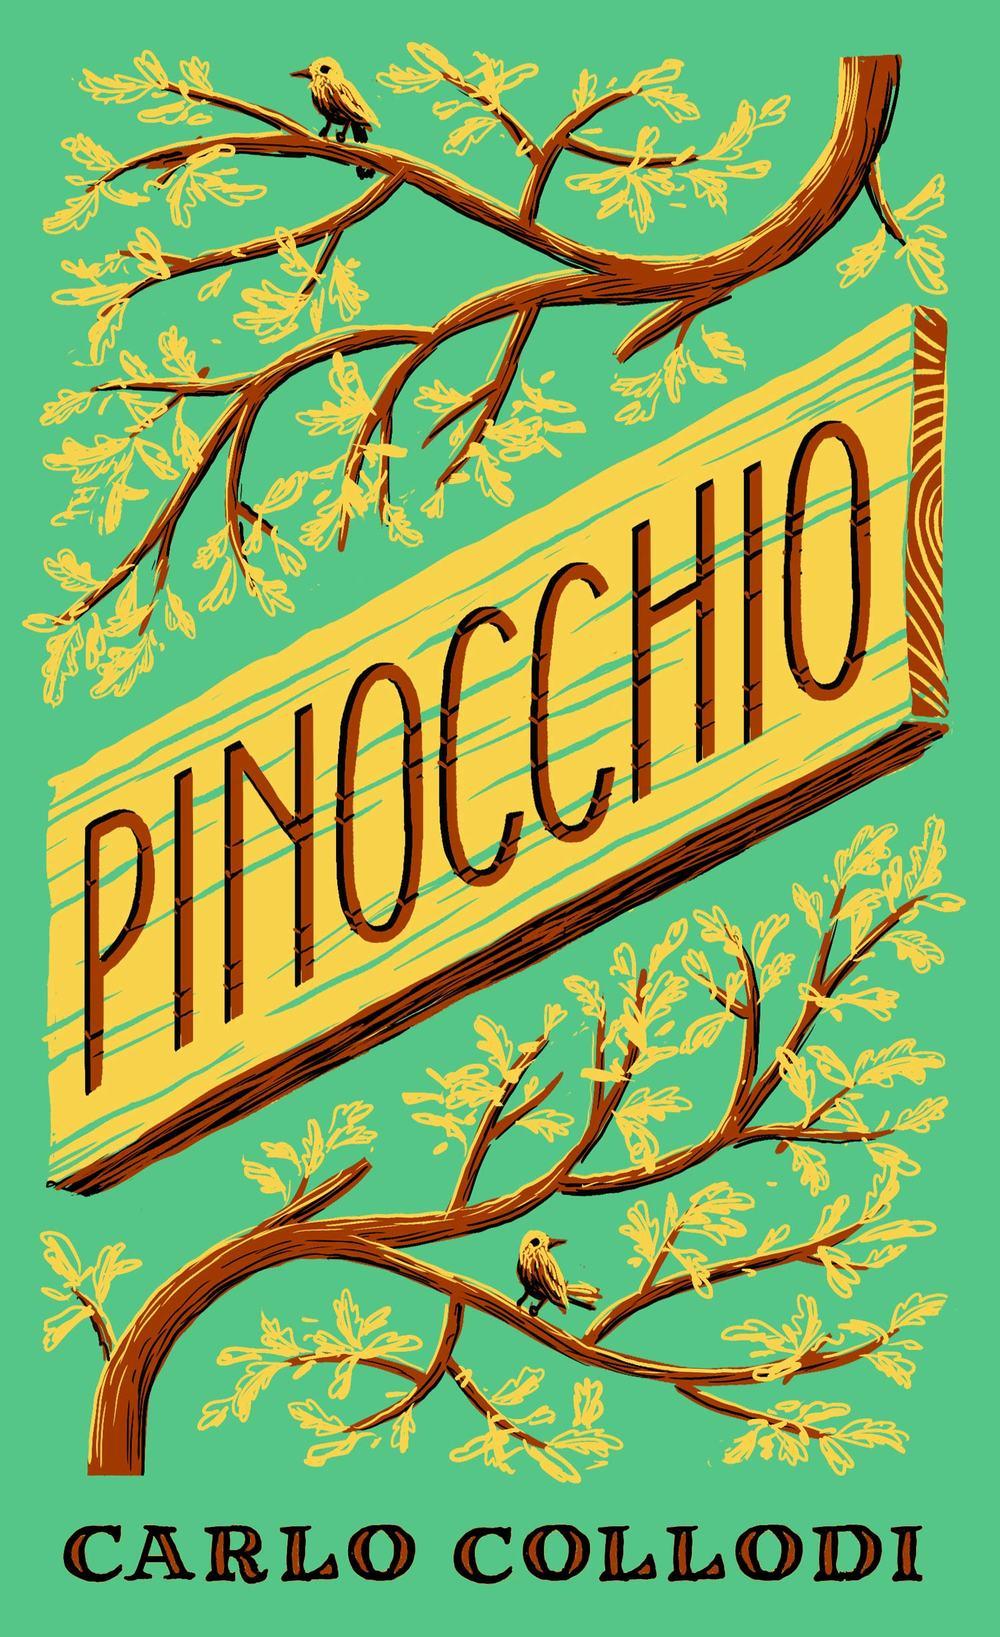 Pinocchio3.jpg